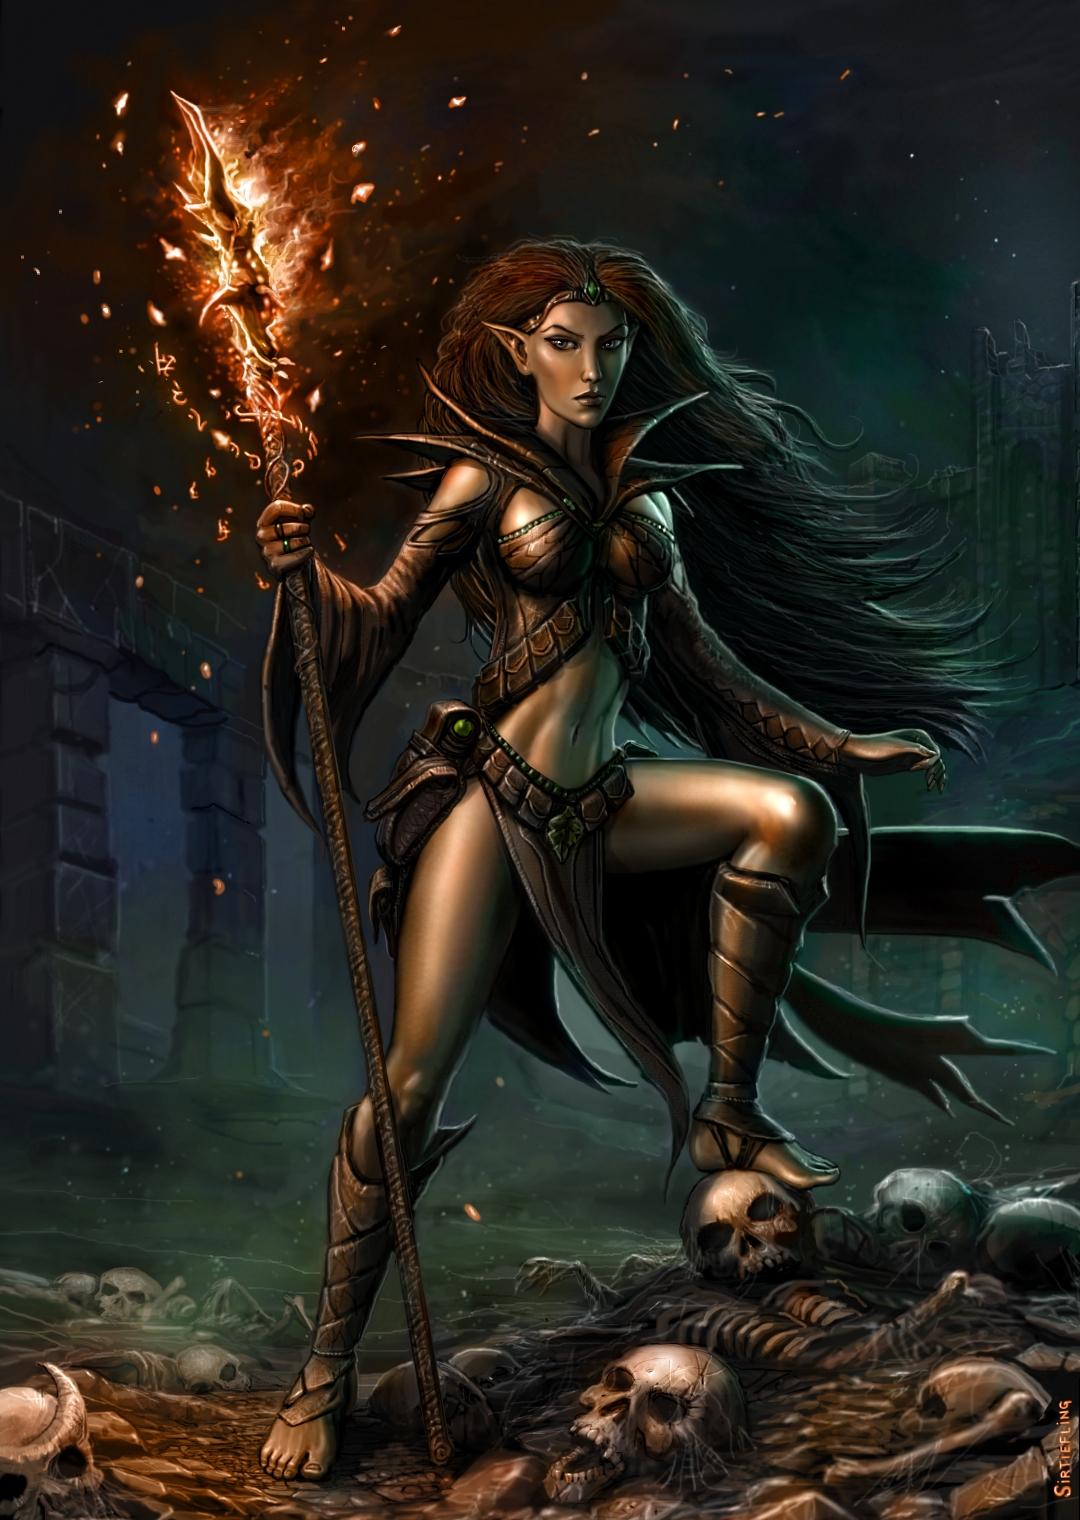 http://orig13.deviantart.net/e145/f/2016/270/f/8/the_iconic_wizard_by_sirtiefling-daj447r.jpg